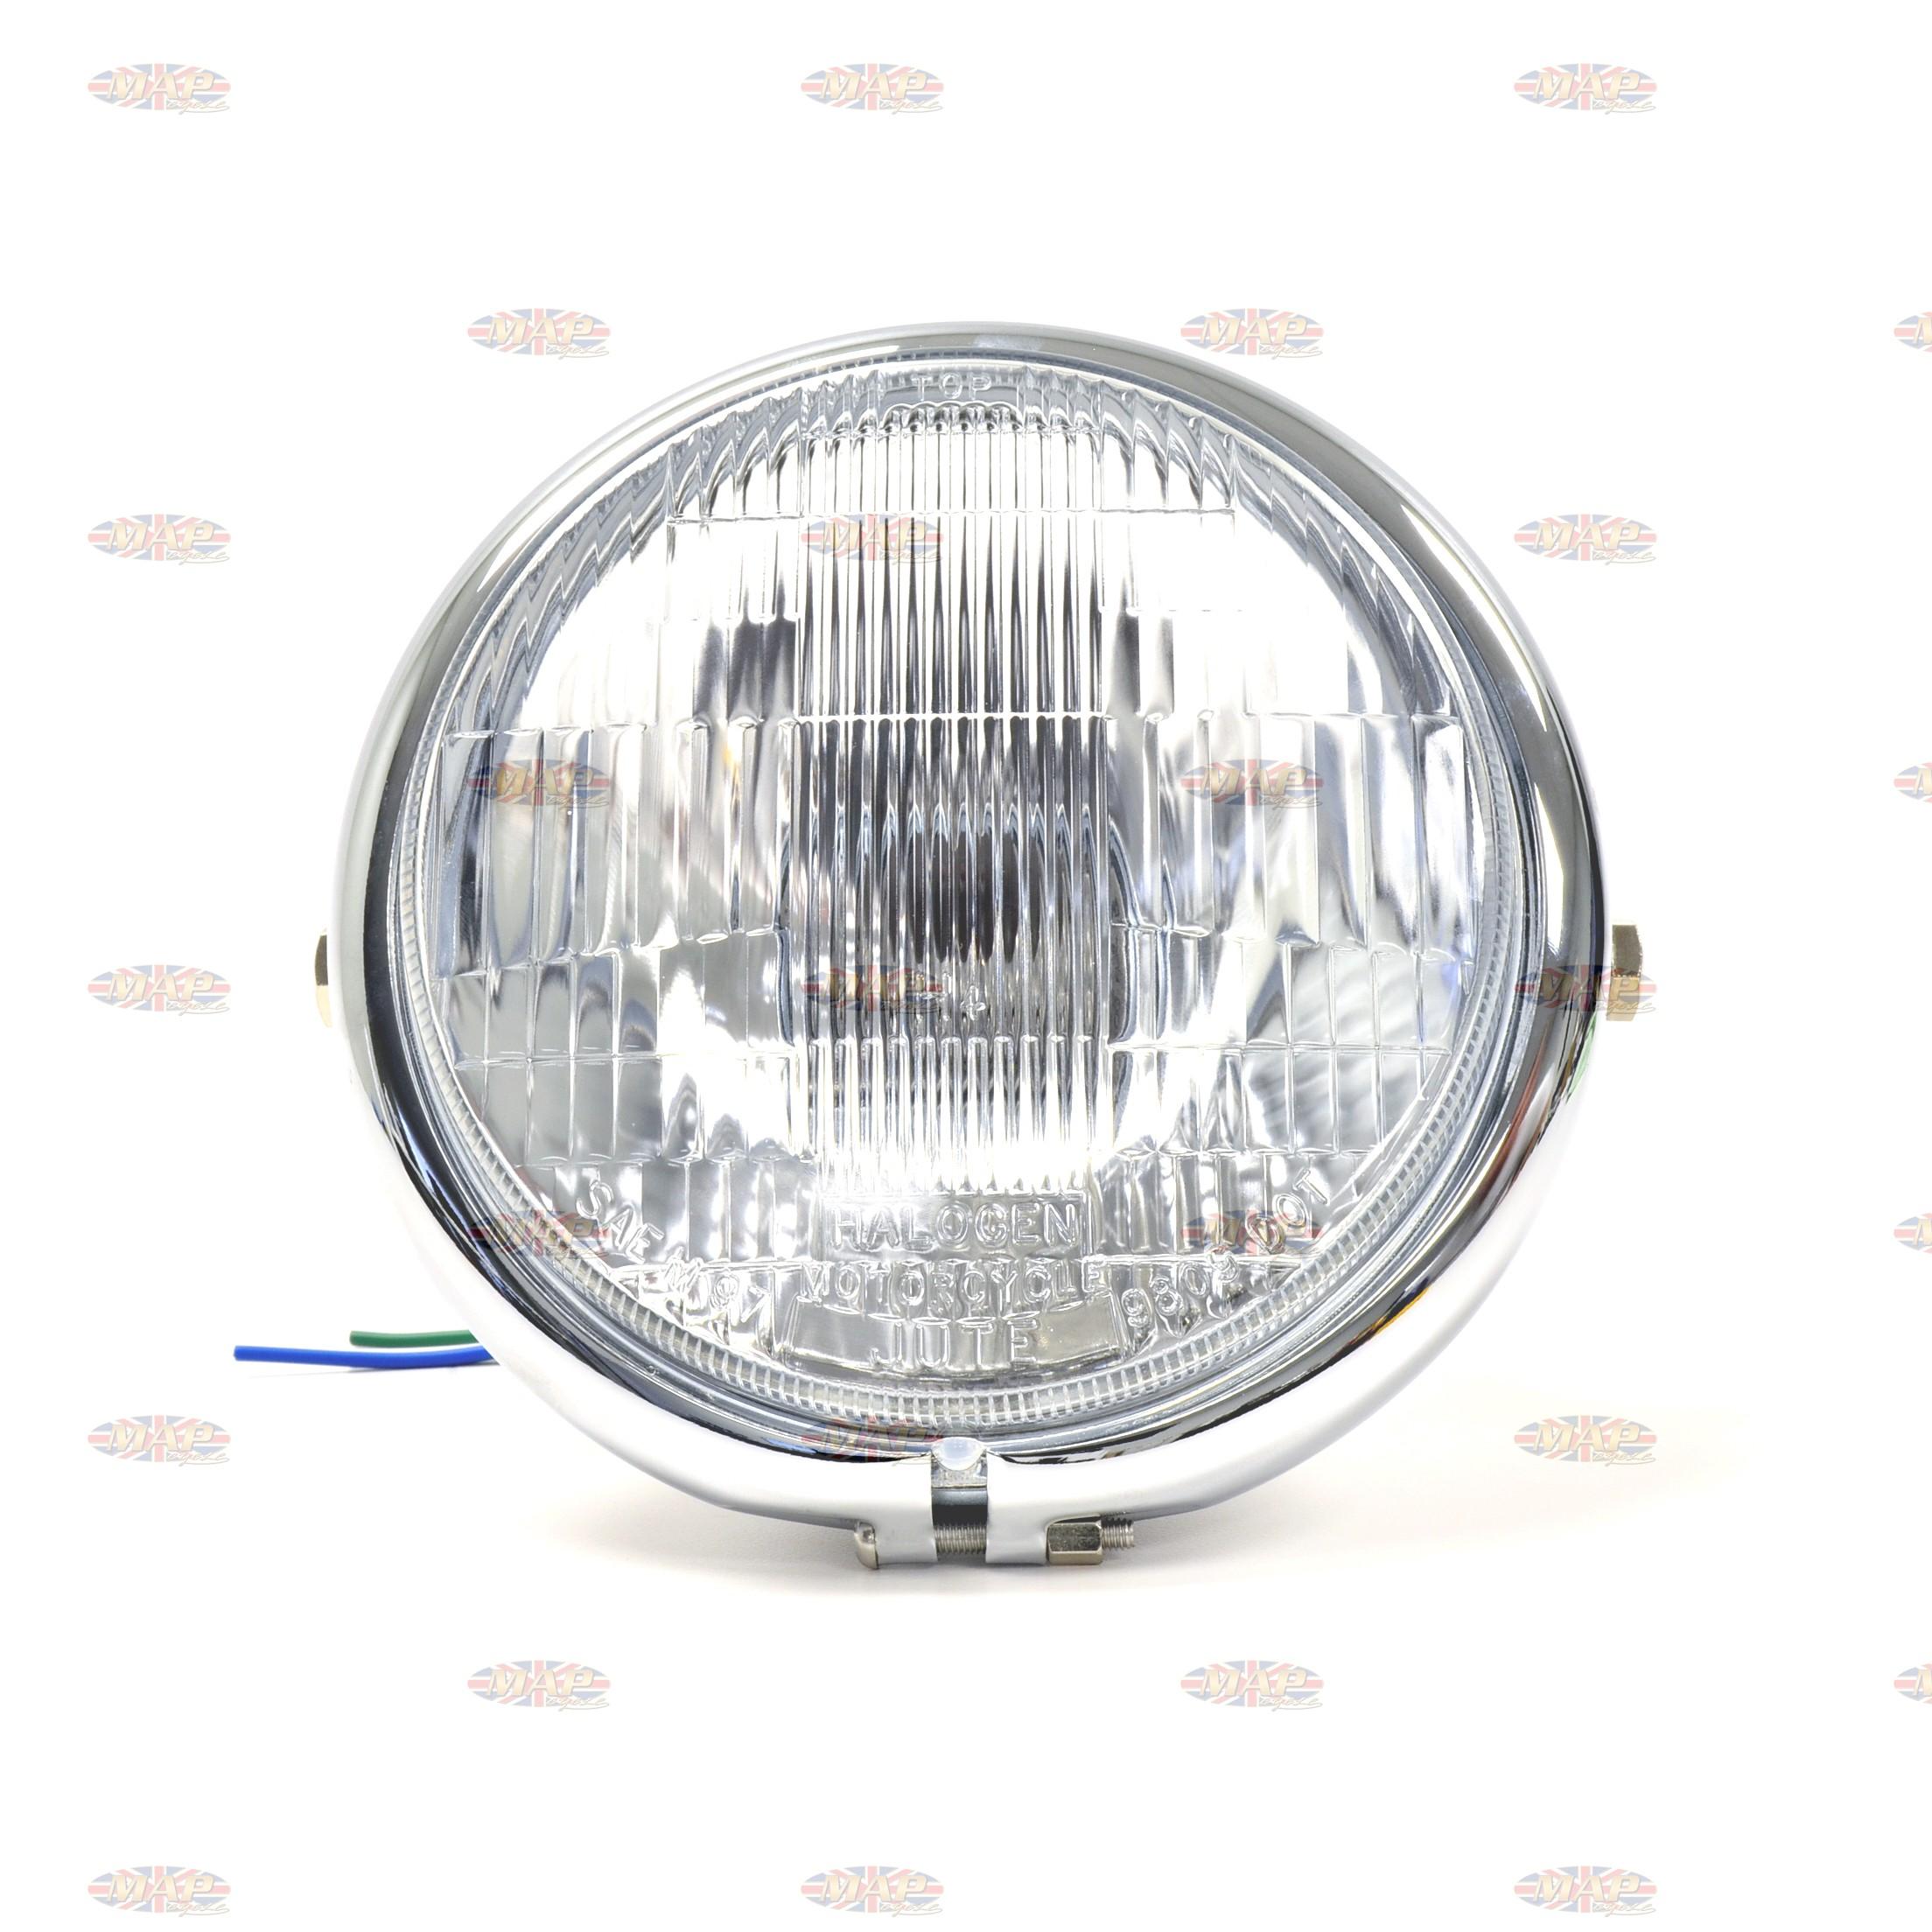 Bates Style 5 75 Chrome Side Mount Headlight With Blue Dot Beam Indicator